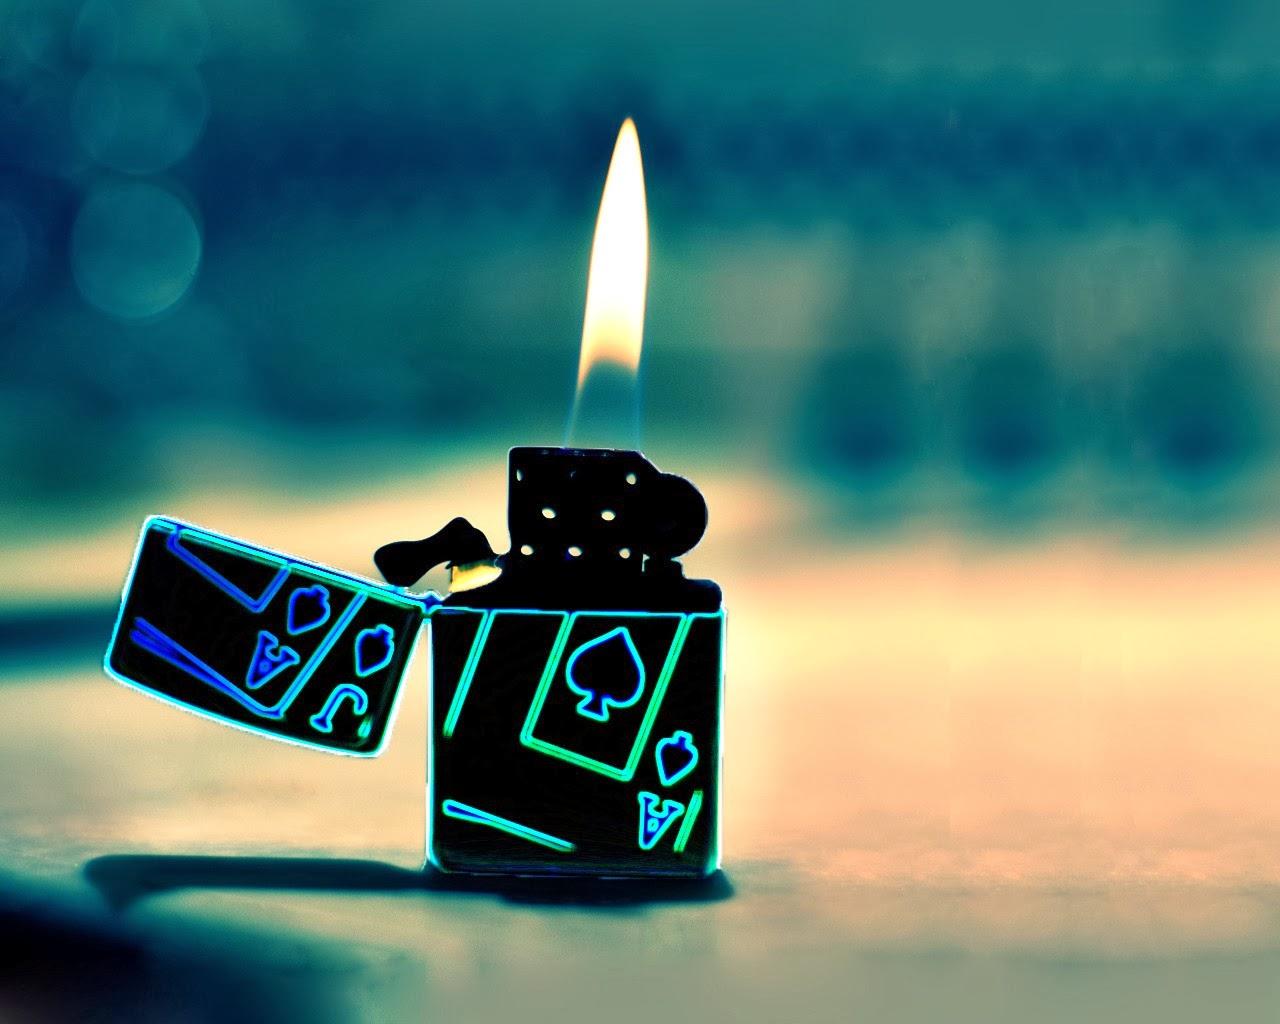 8aead-blue-fire-deviantart-zippo-depth-of-field-lighters-ace-of-spades-fresh-new-hd-wallpaper.jpg